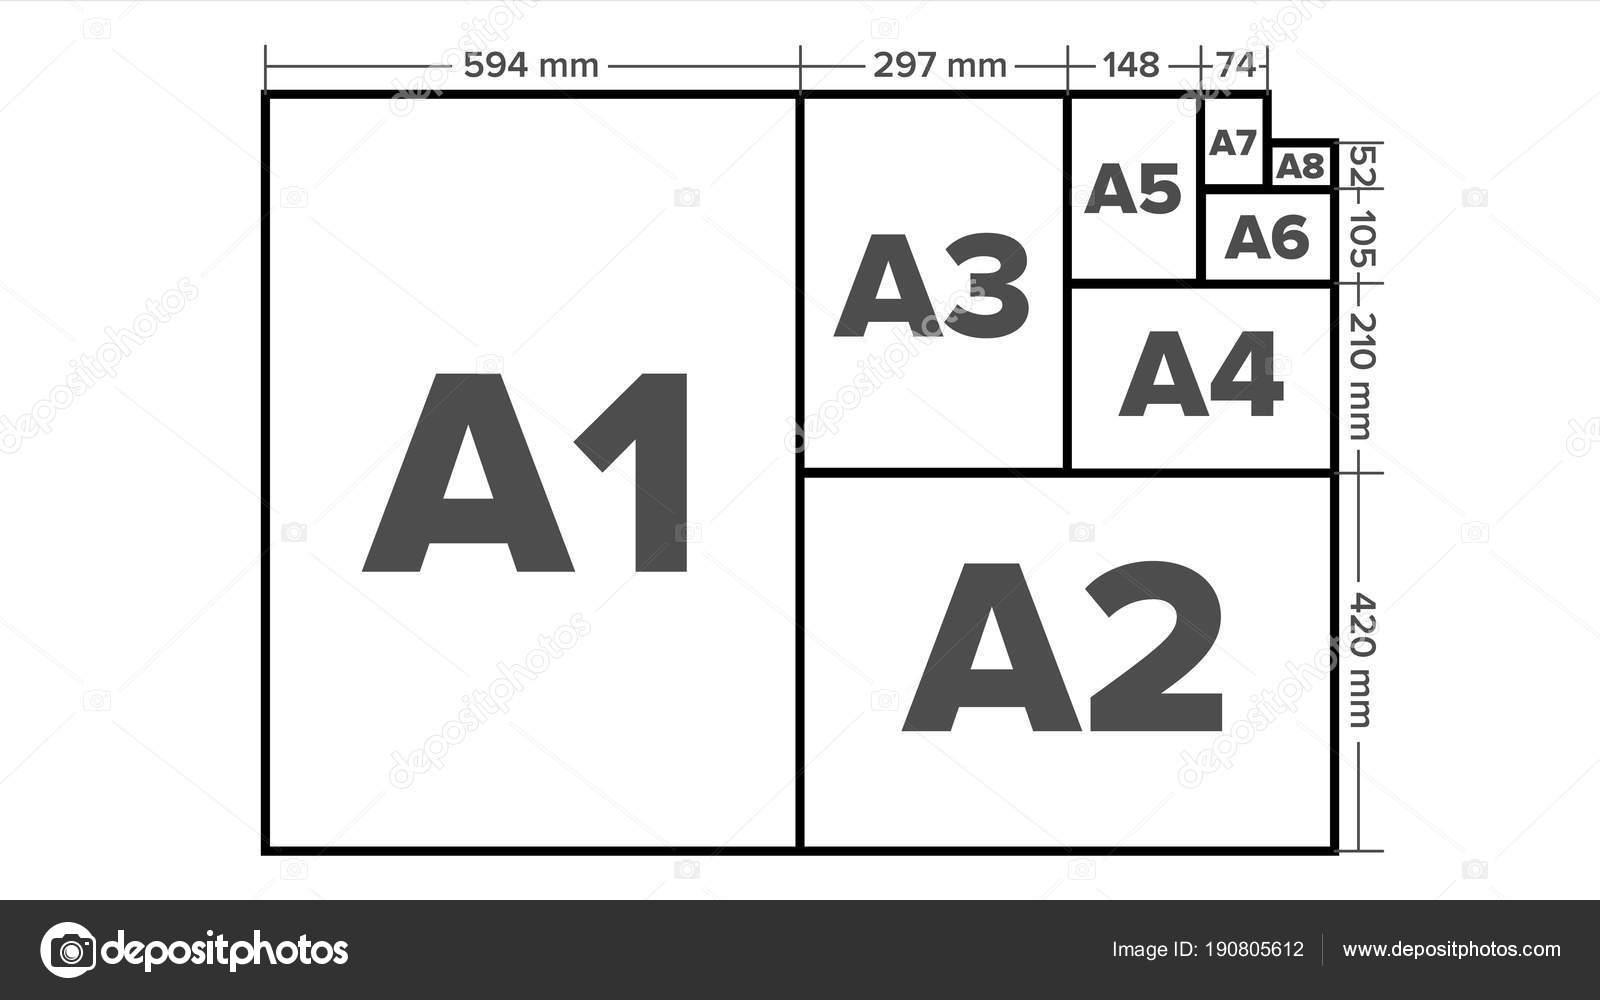 vetor de tamanhos de papel a1 a2 a3 a4 a5 a6 a7 a8 formatos